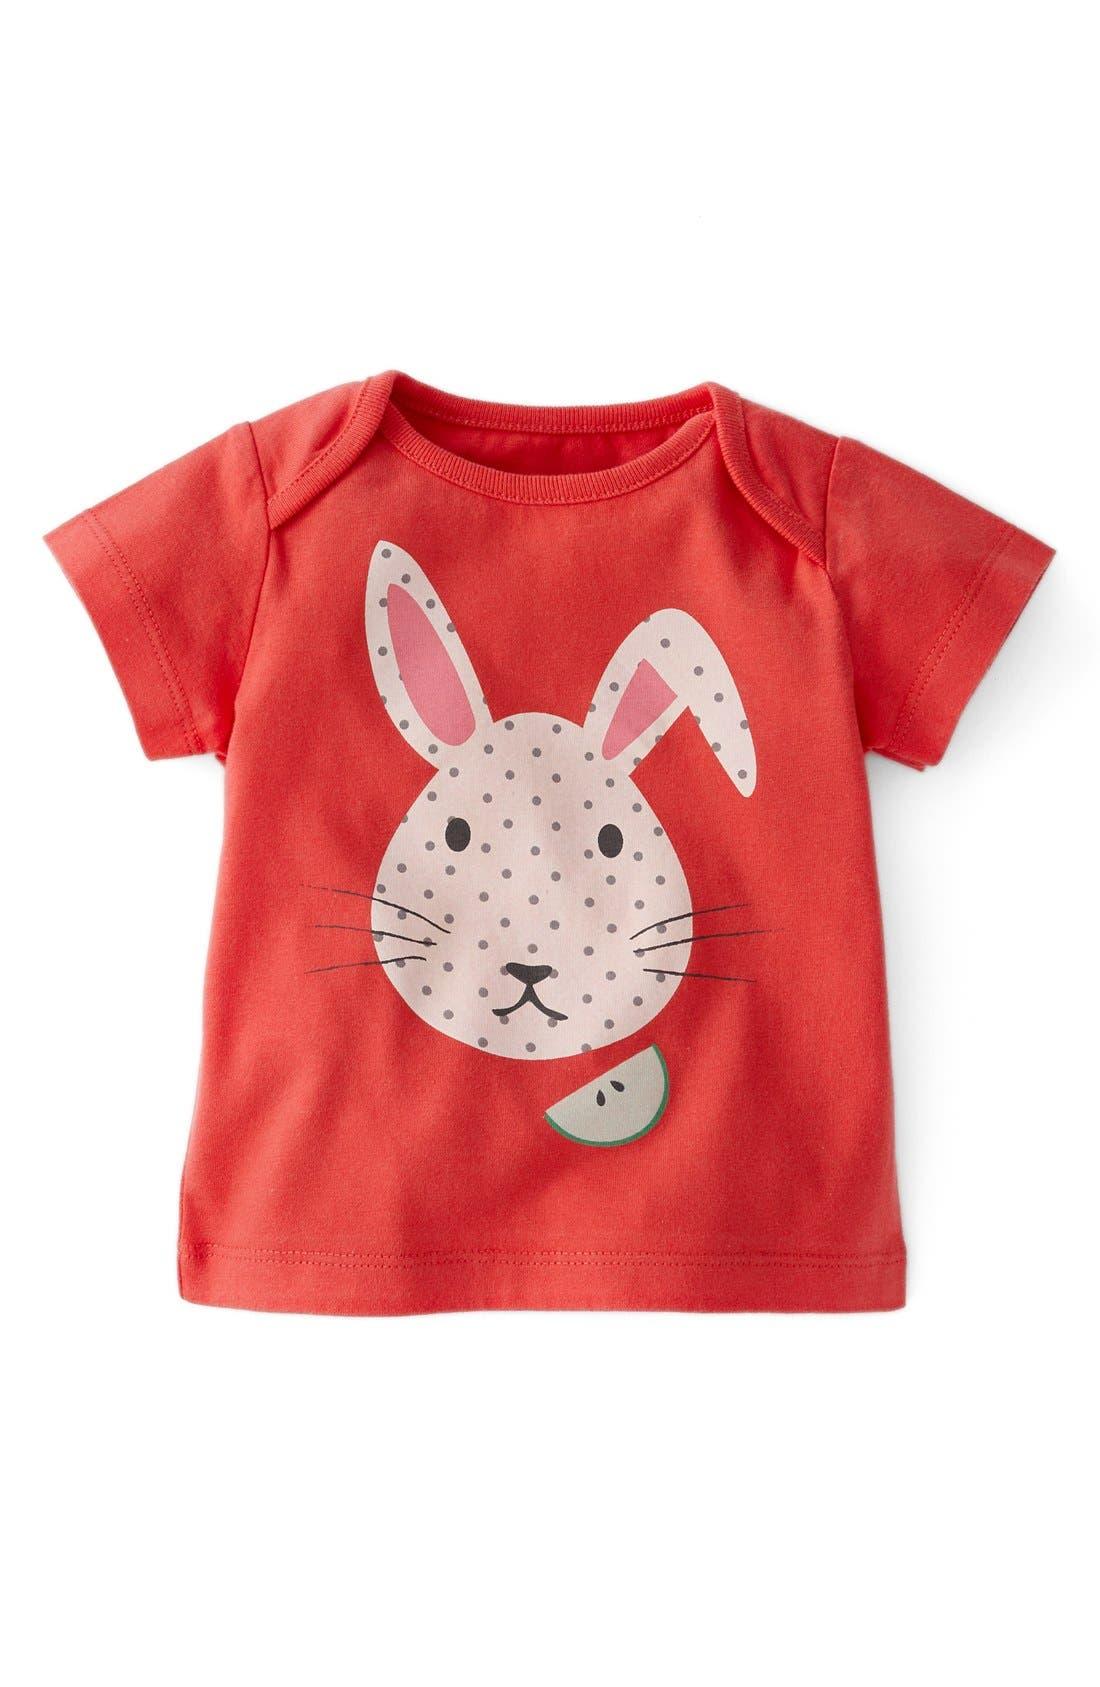 Alternate Image 1 Selected - Mini Boden 'Animal Friends' T-Shirt (Baby Girls)